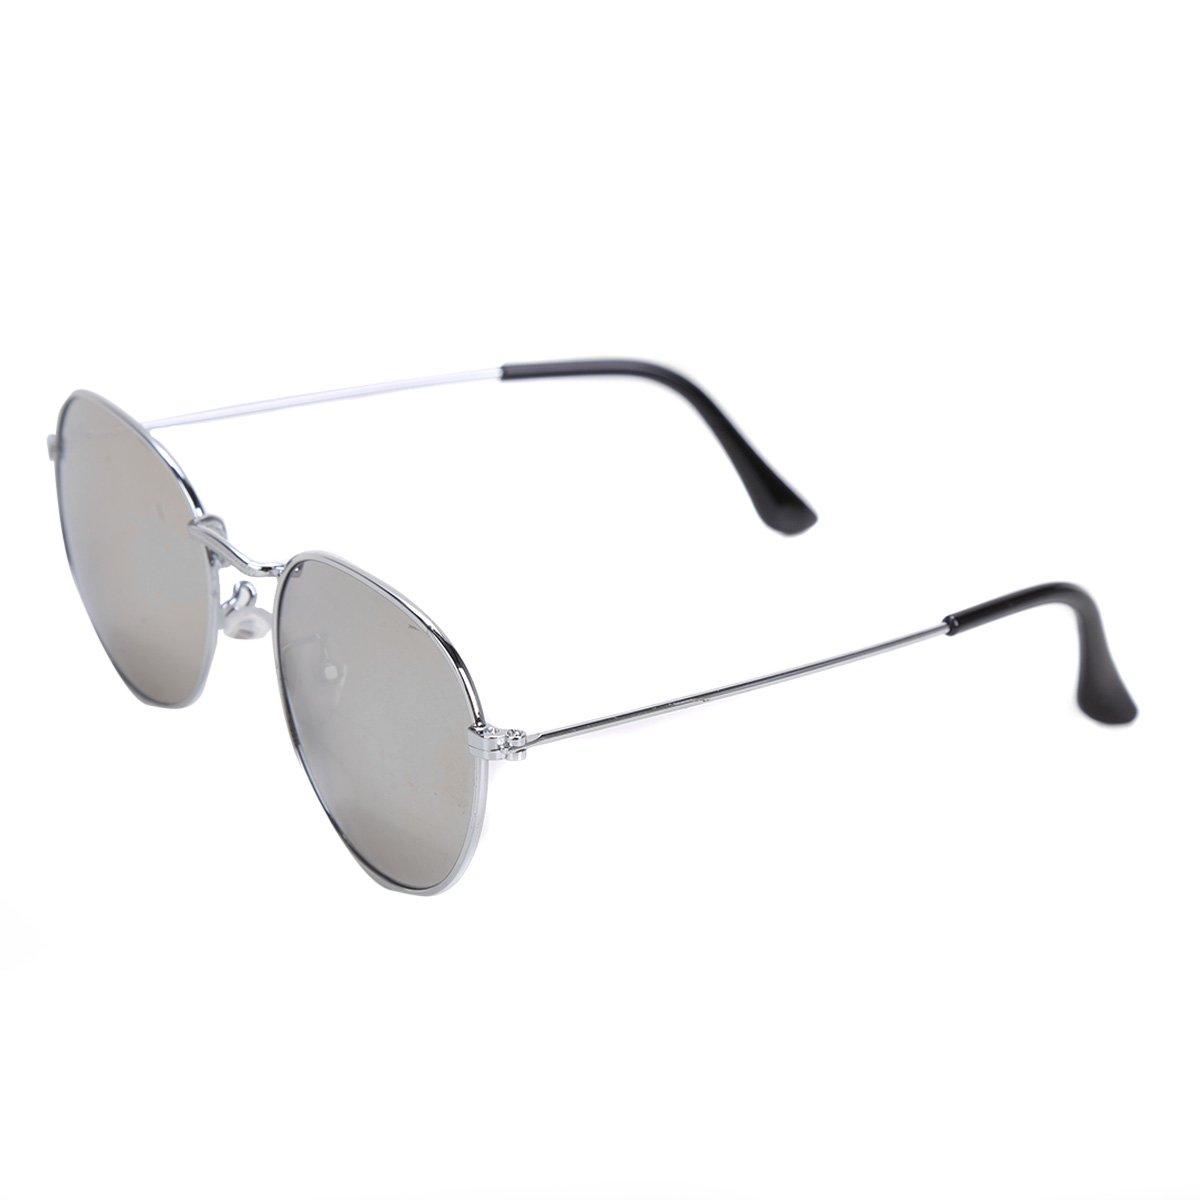 Óculos de Sol Polo London Club Redondo Espelhado Feminino